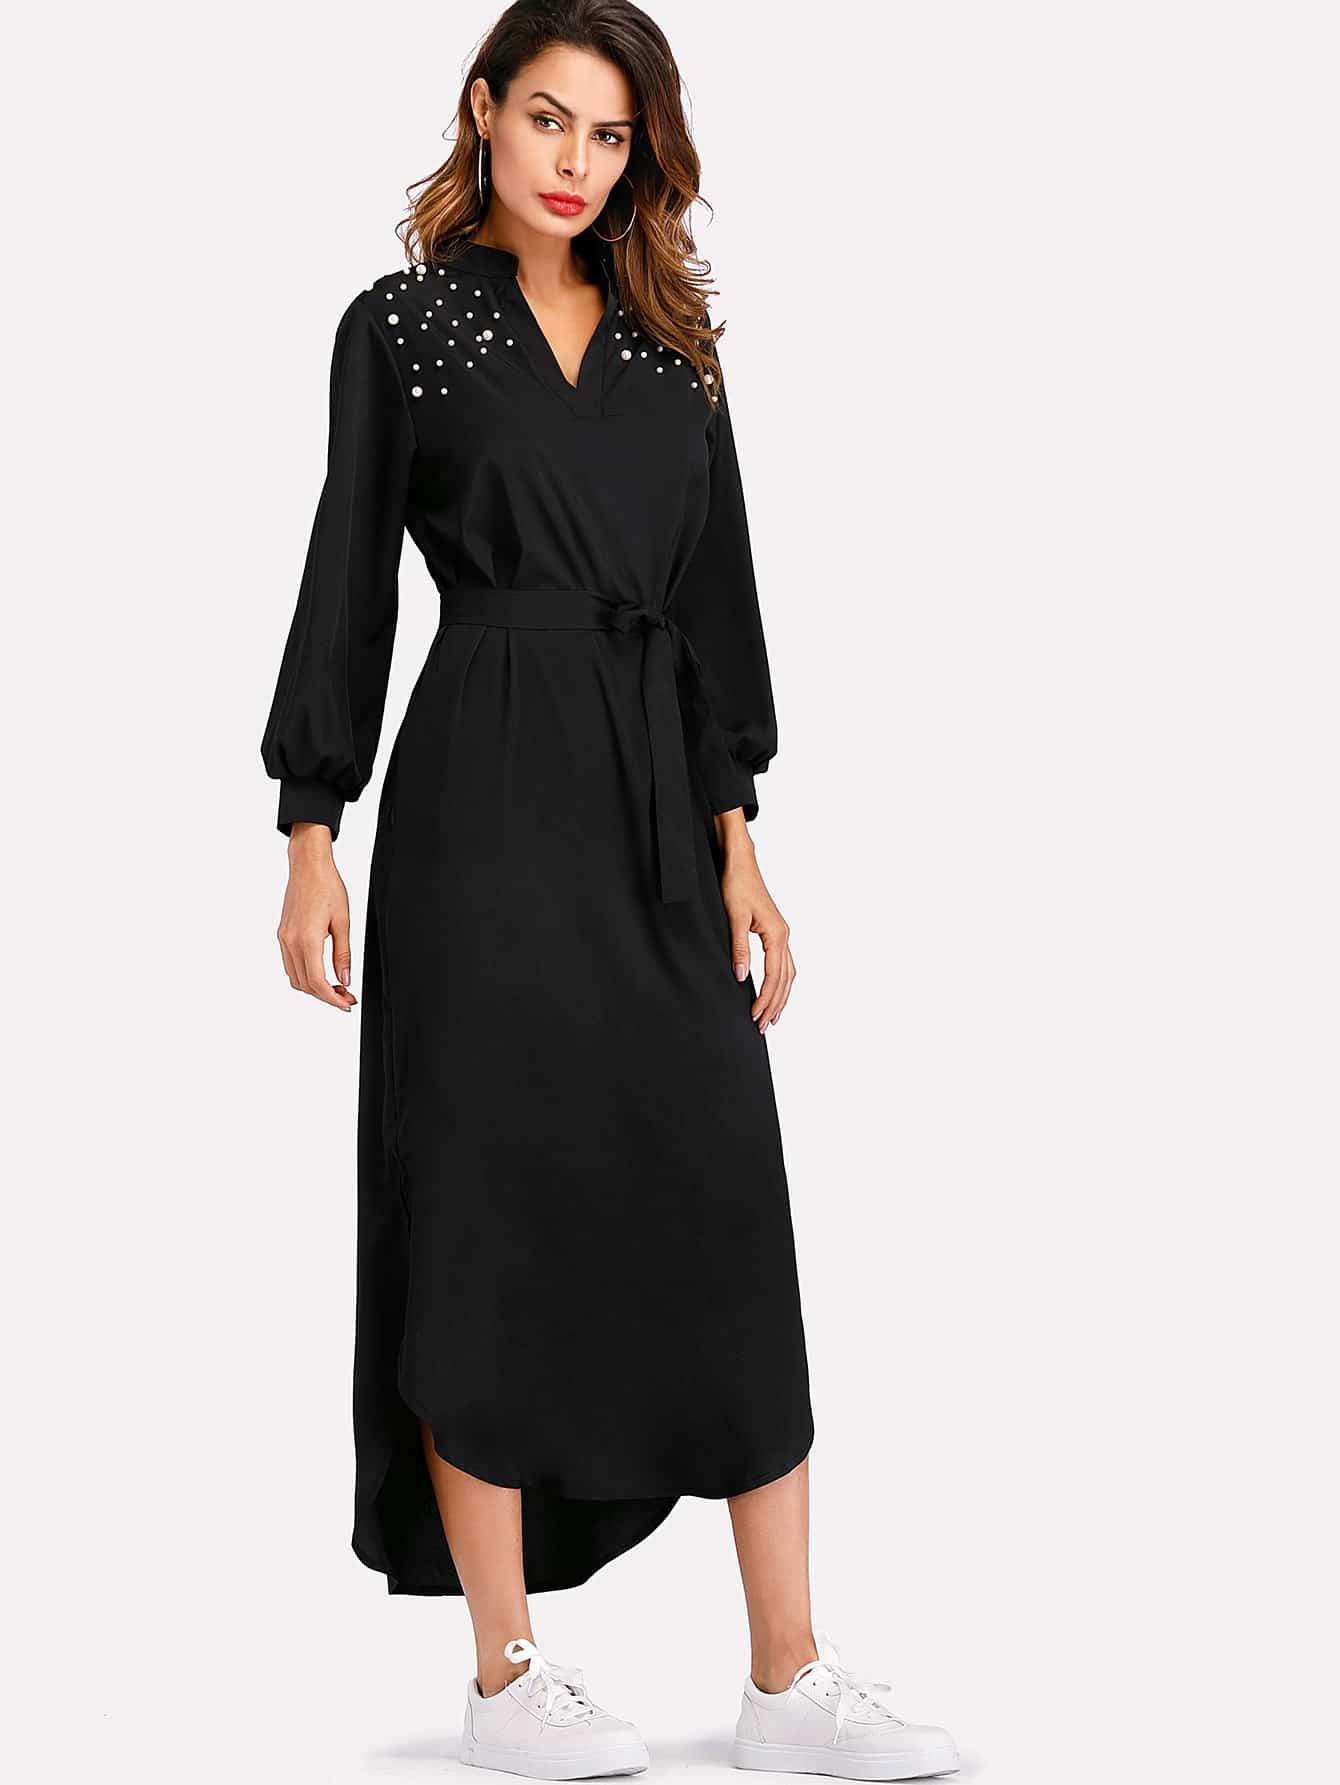 Curved Hem Pearl Beaded Self Tie Waist Dress rolled sleeve slit side curved hem self tie dress